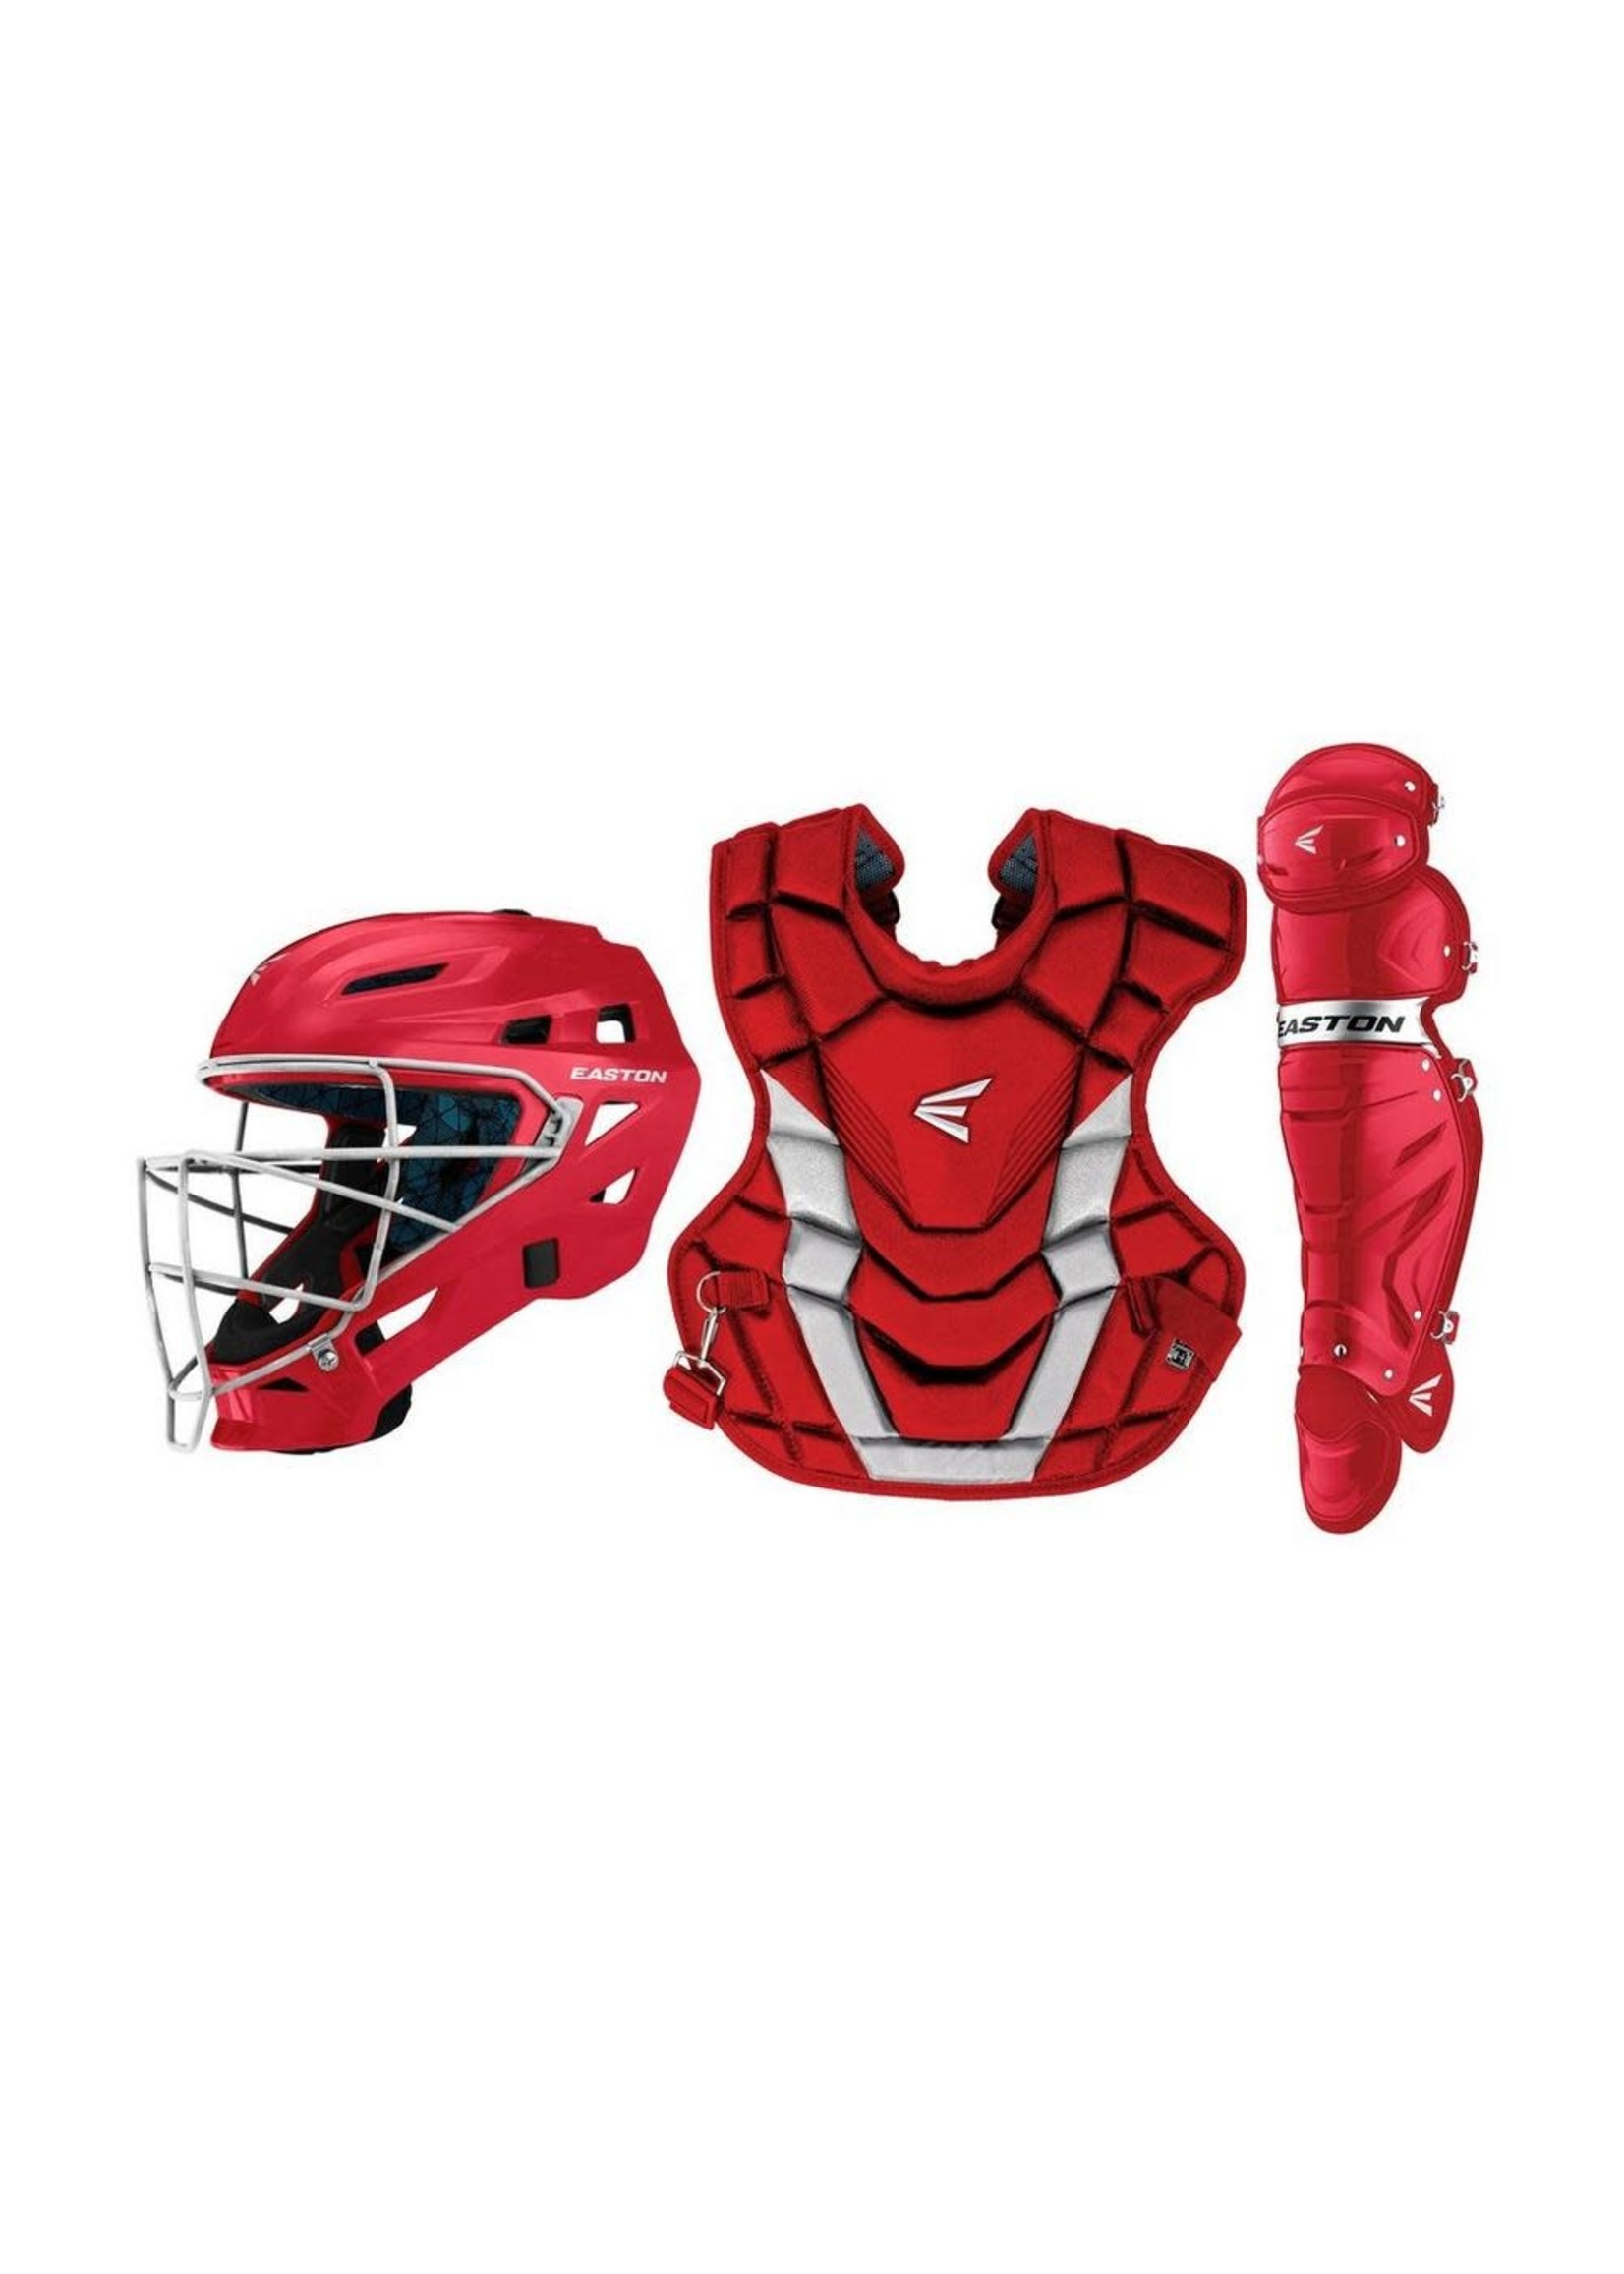 Easton Baseball (Canada) EASTON GAMETIME ADULT EQUIPEMENT RECEVEUR